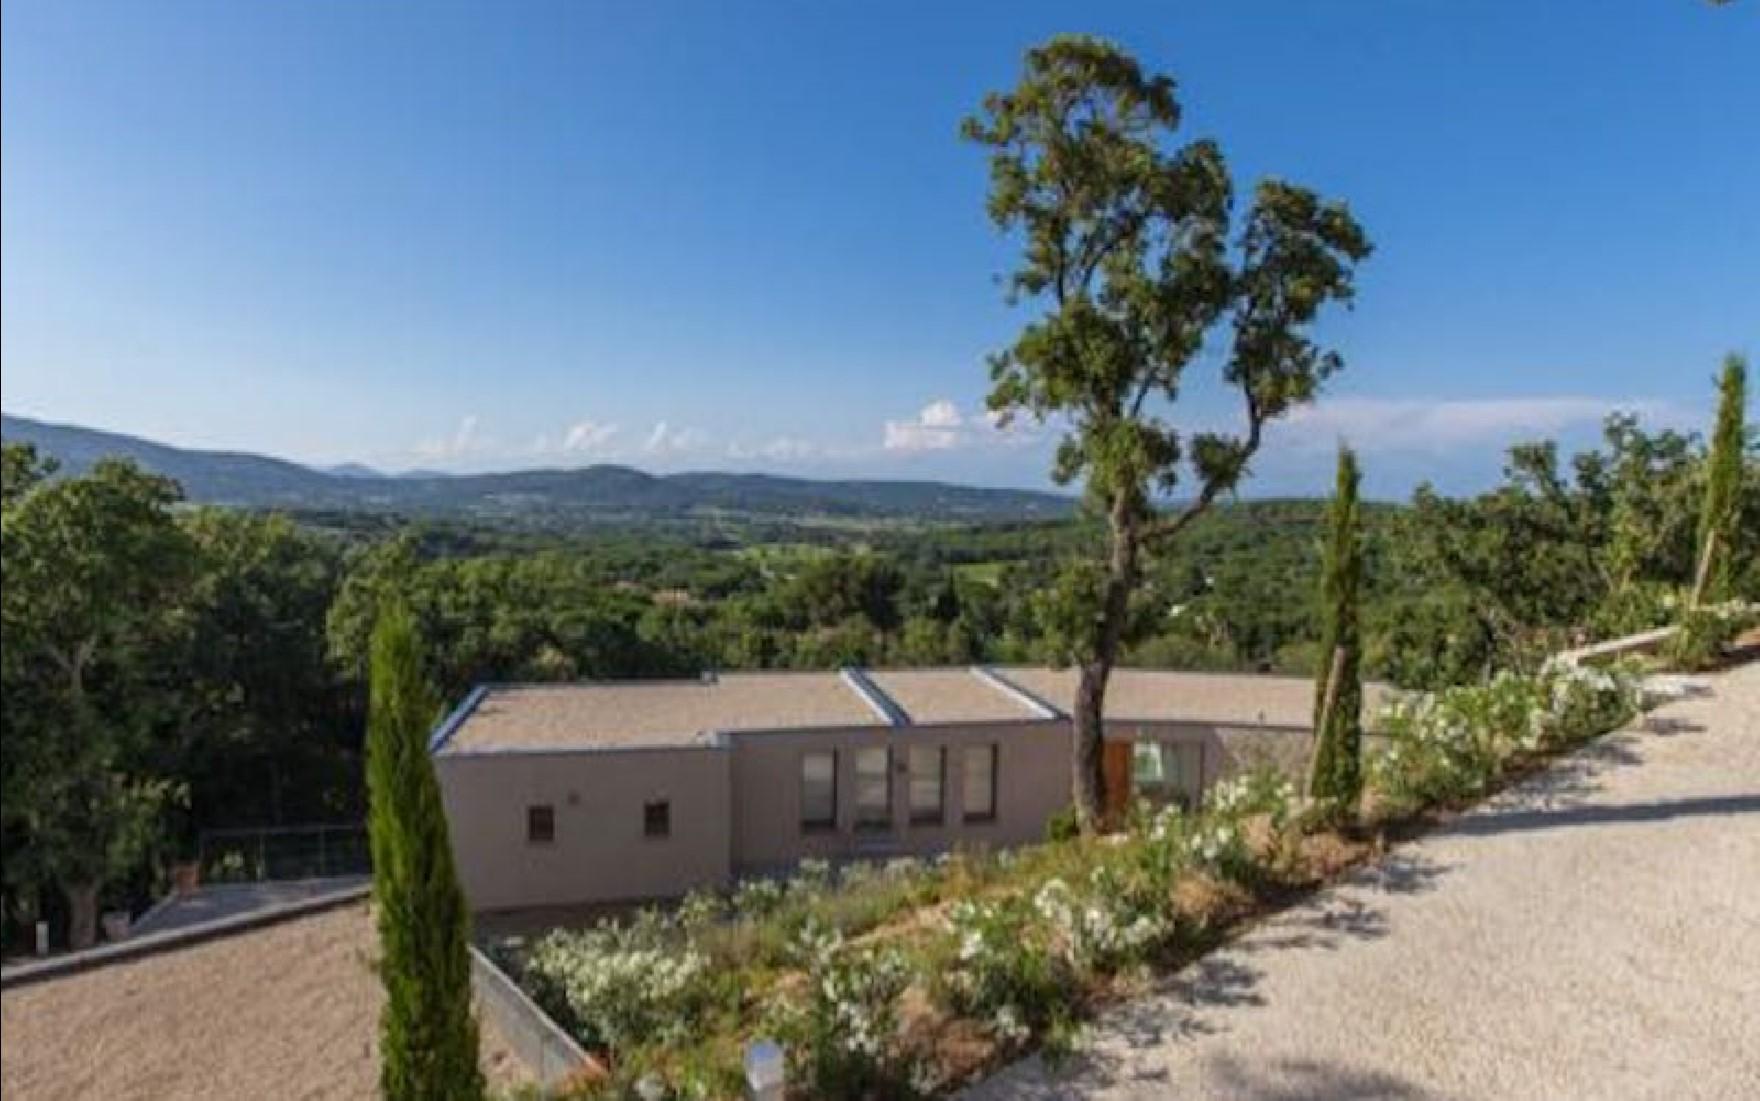 Villa-Marguerite-St-Tropez-Provence-France-Exterior-1.jpg